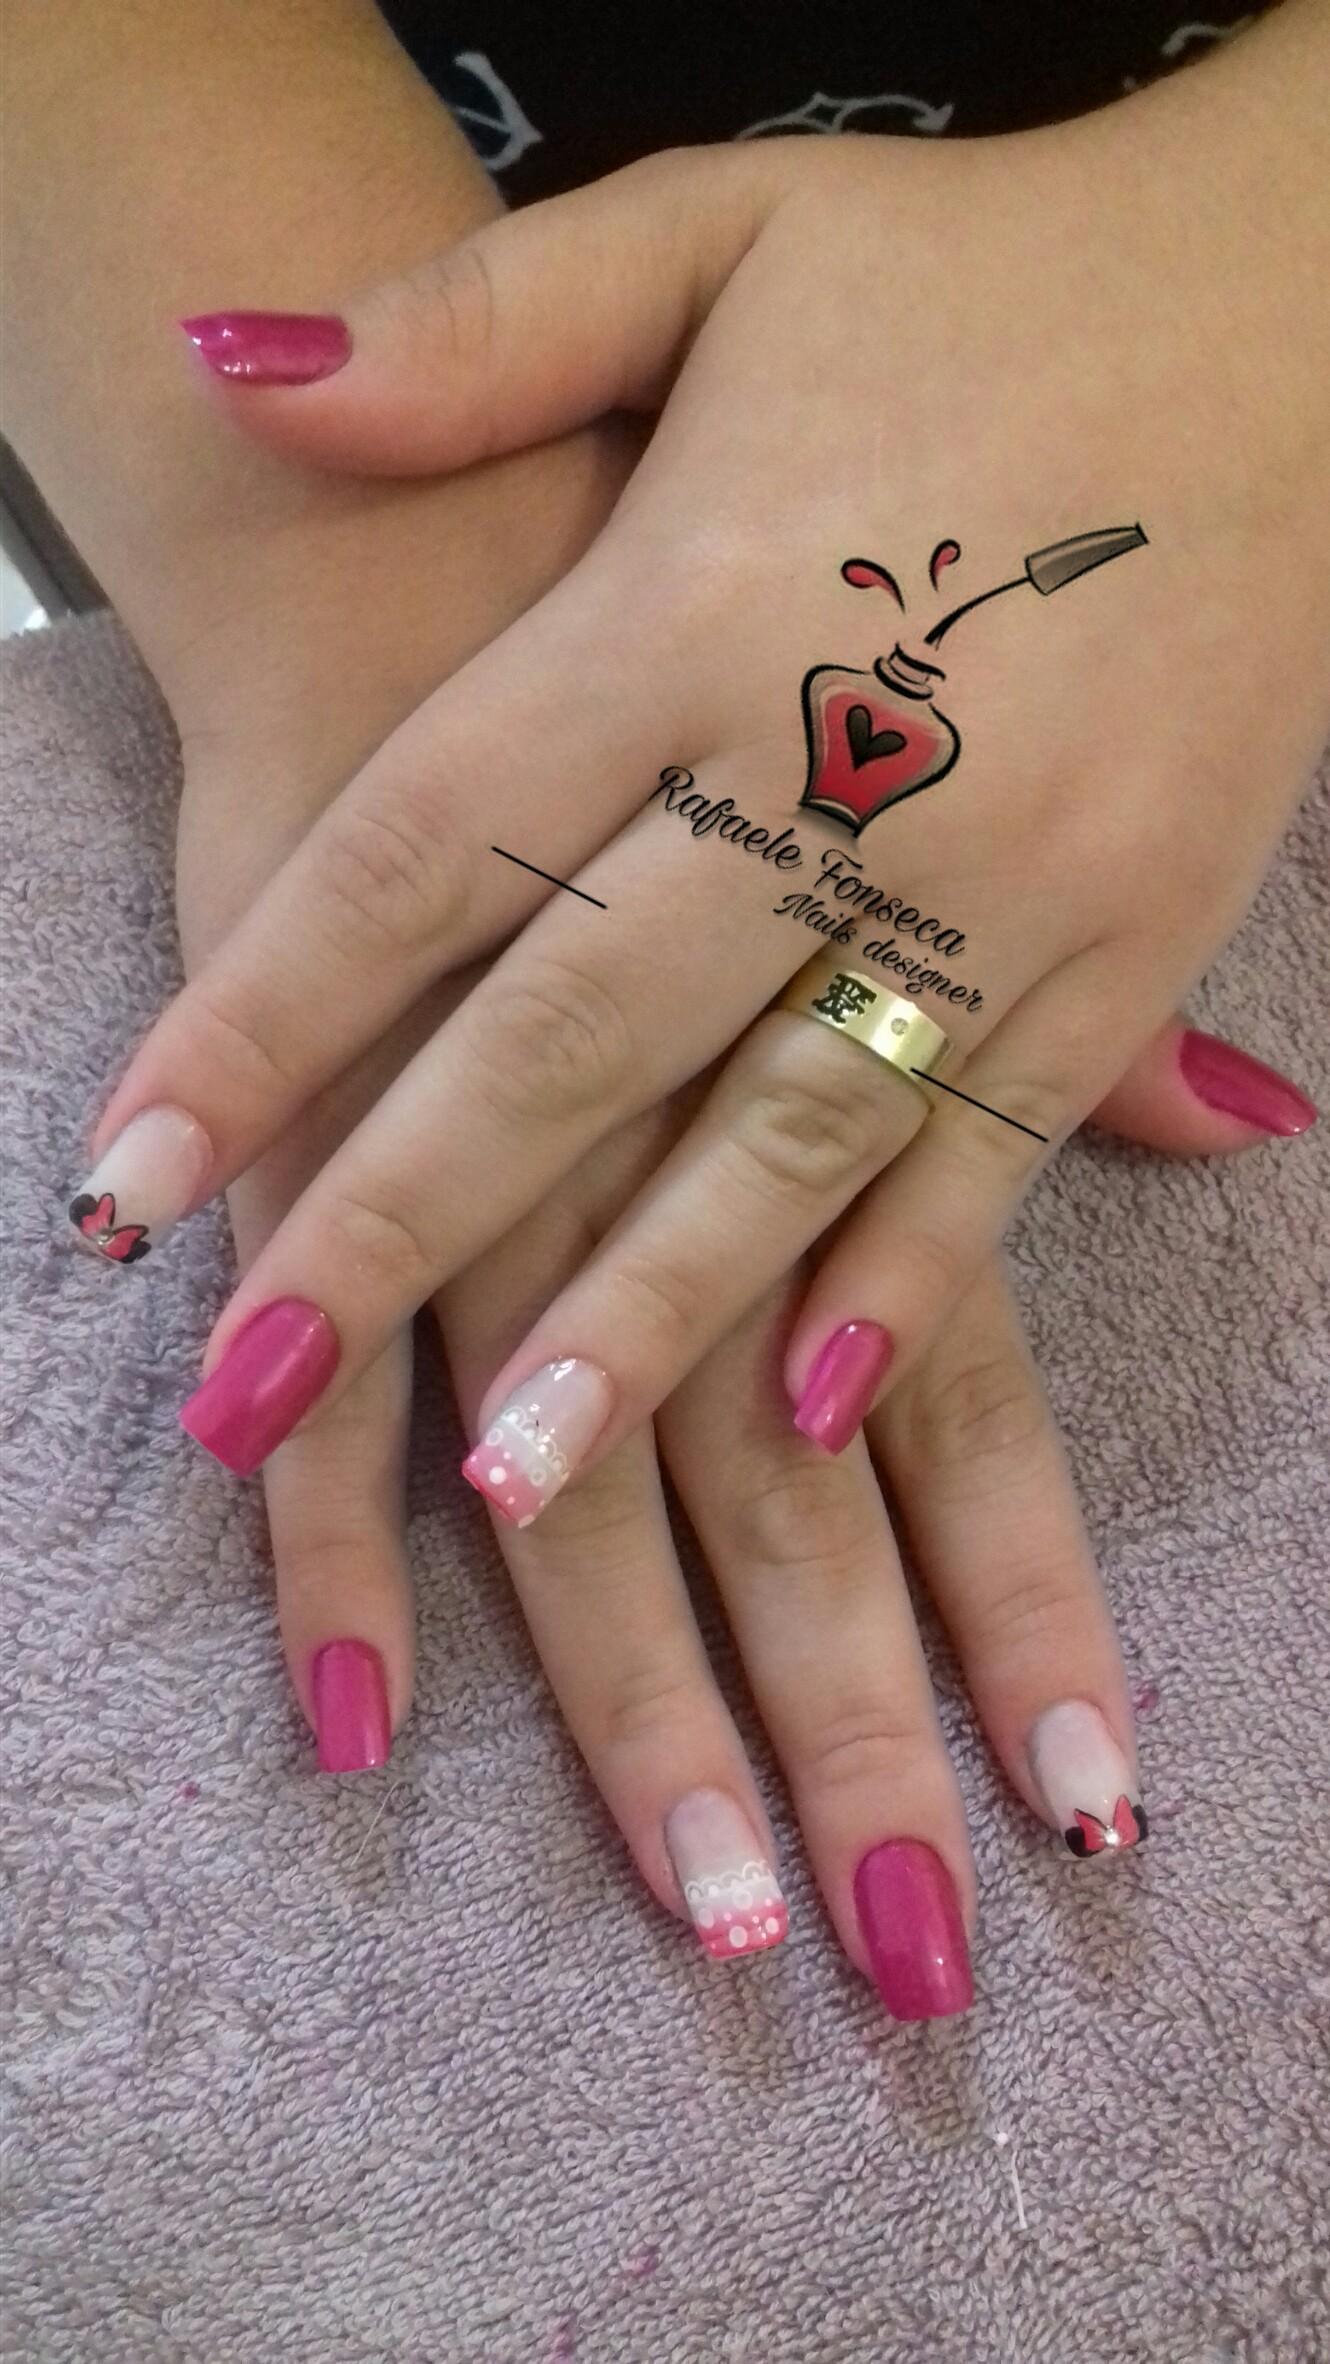 Cutilada, esmaltada é desenhada a mão 💅❤ unha manicure e pedicure